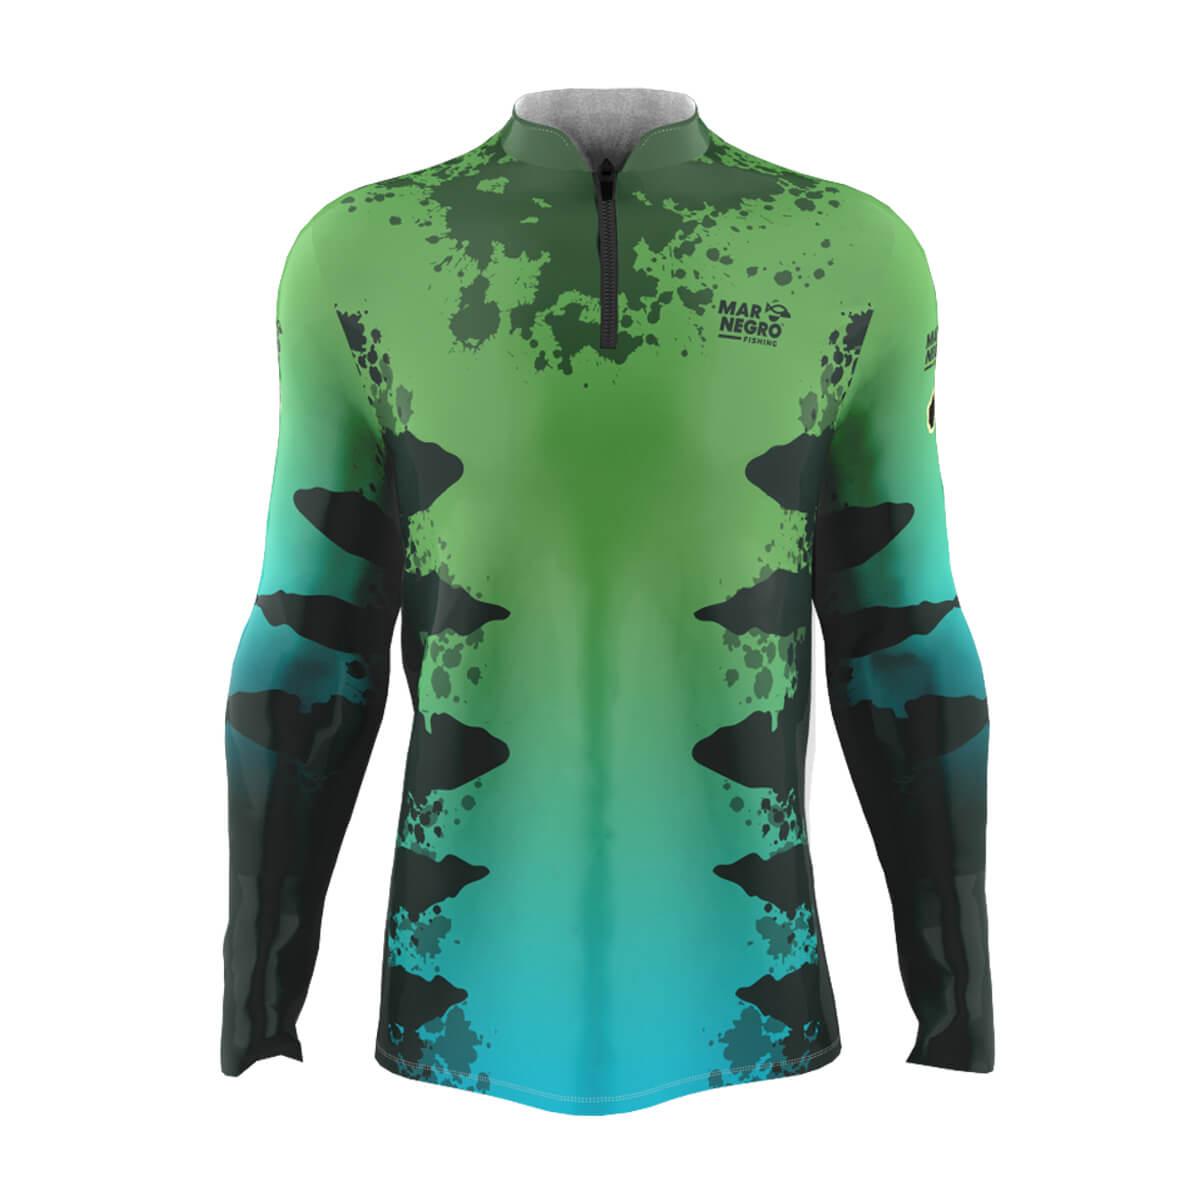 Camiseta de Pesca Mar Negro 2021 Zig Zara  - Pró Pesca Shop